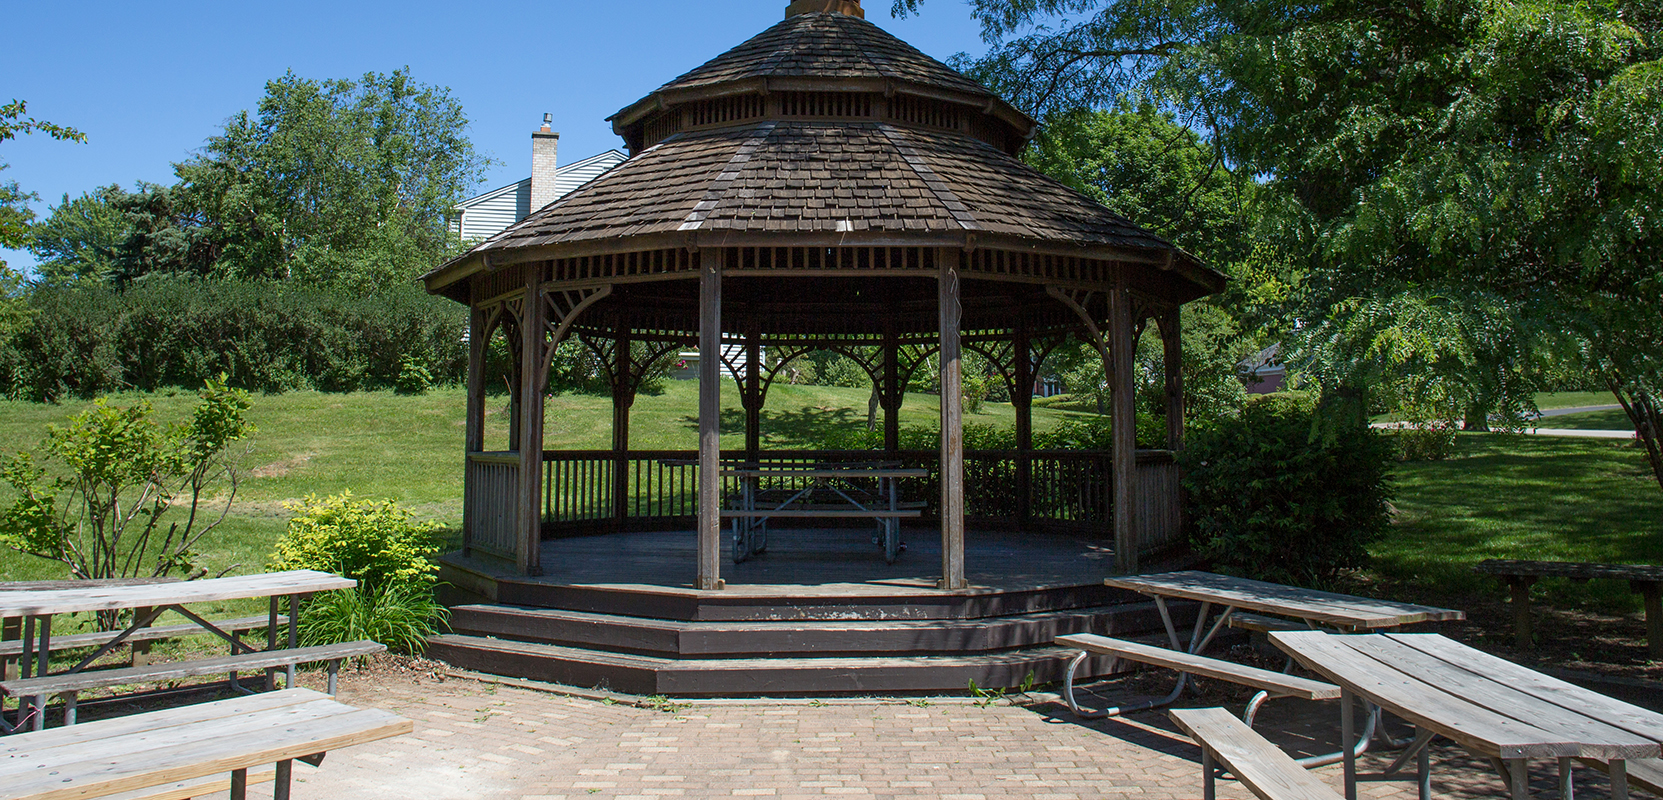 Turner Park Gazebo